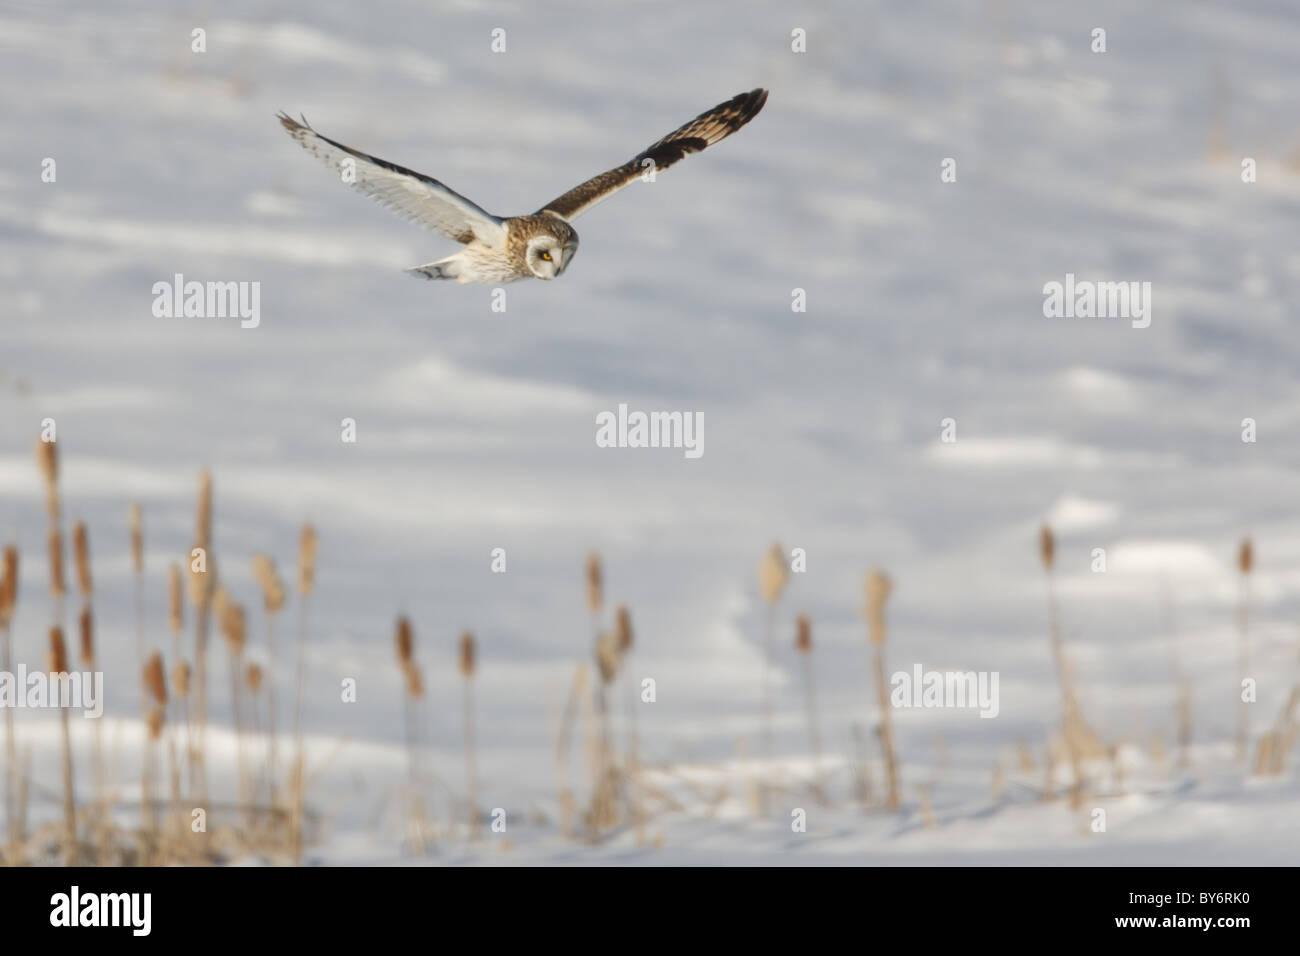 Sumpfohreule (Asio Flammeus) fliegen während der Jagd nach Nahrung Stockfoto